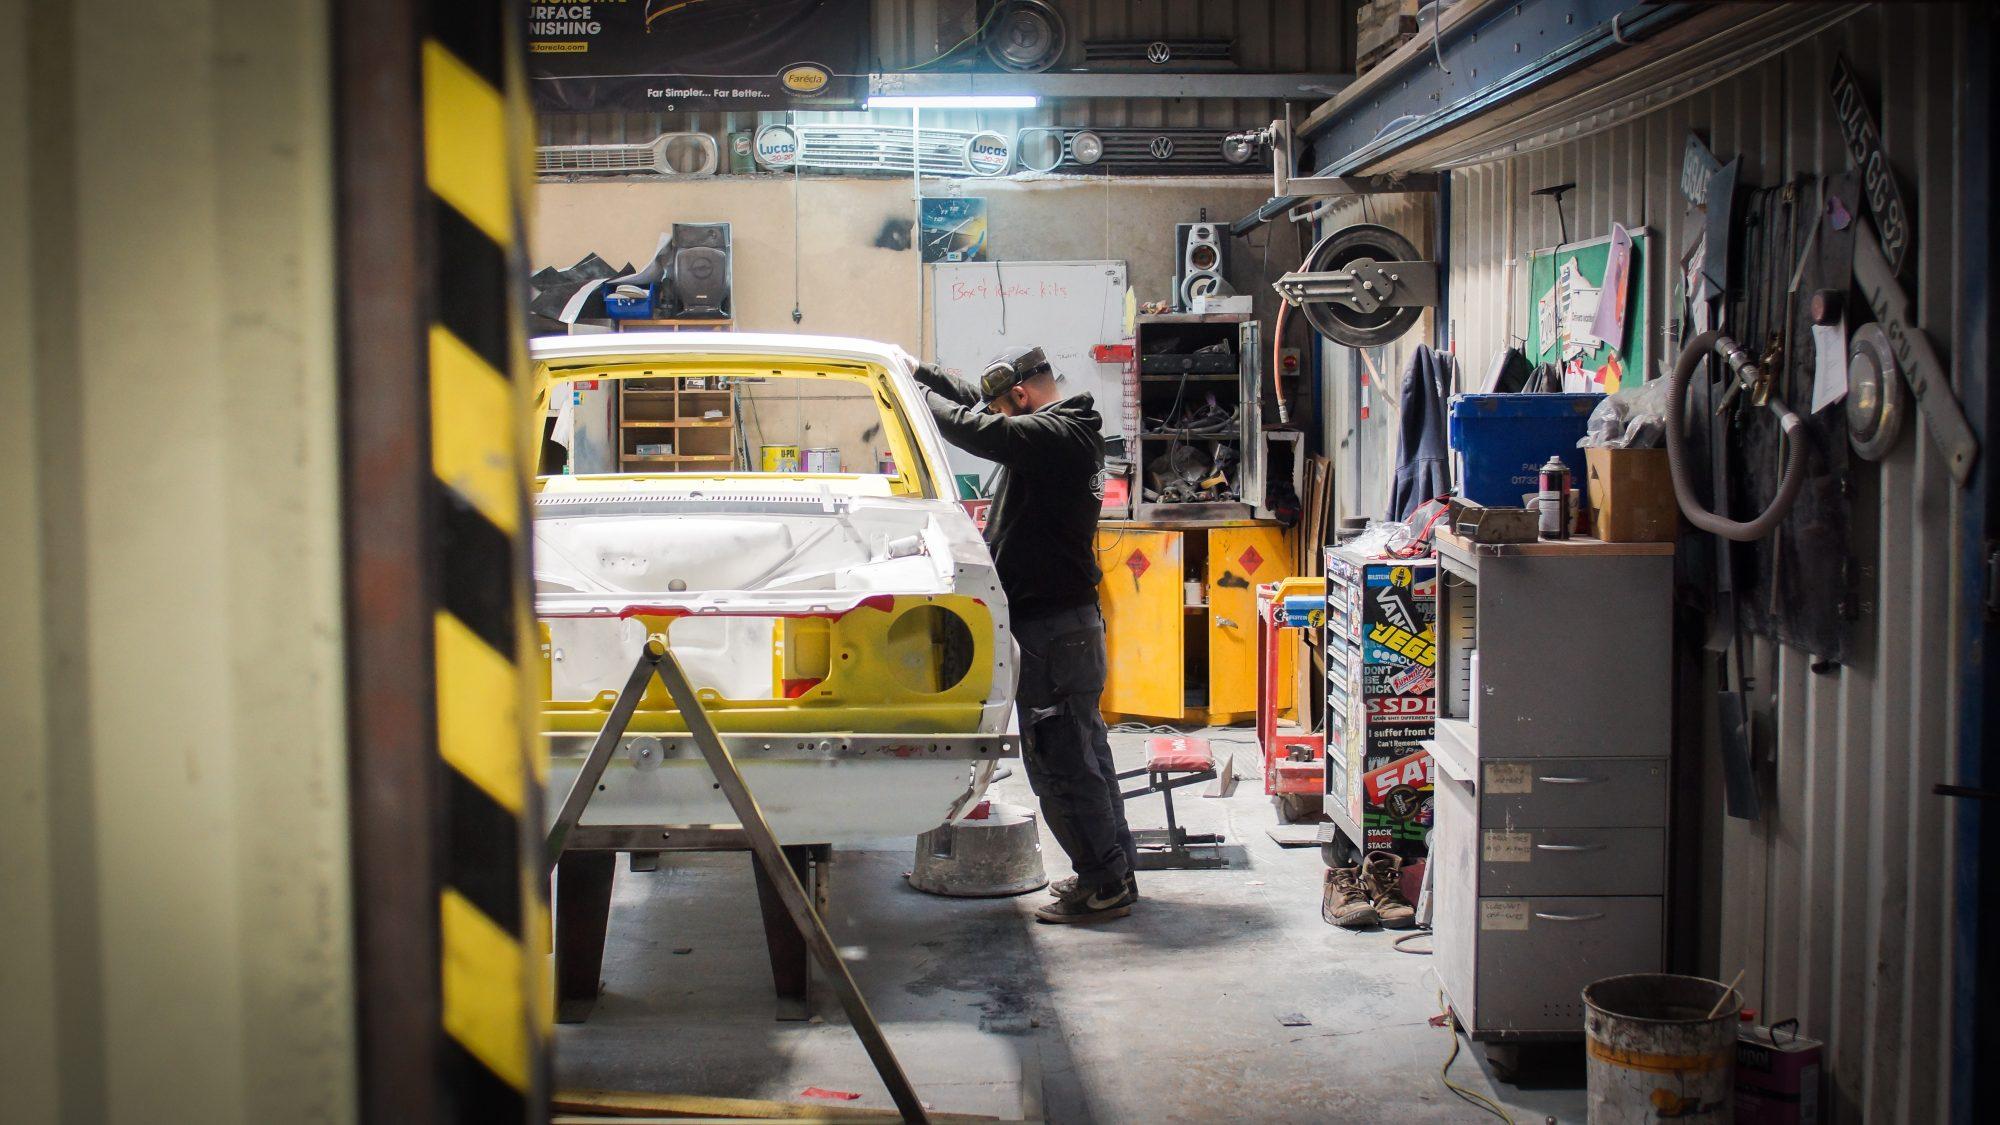 Mk2 Escort, Ford Escort, motoring, automotive, retropower